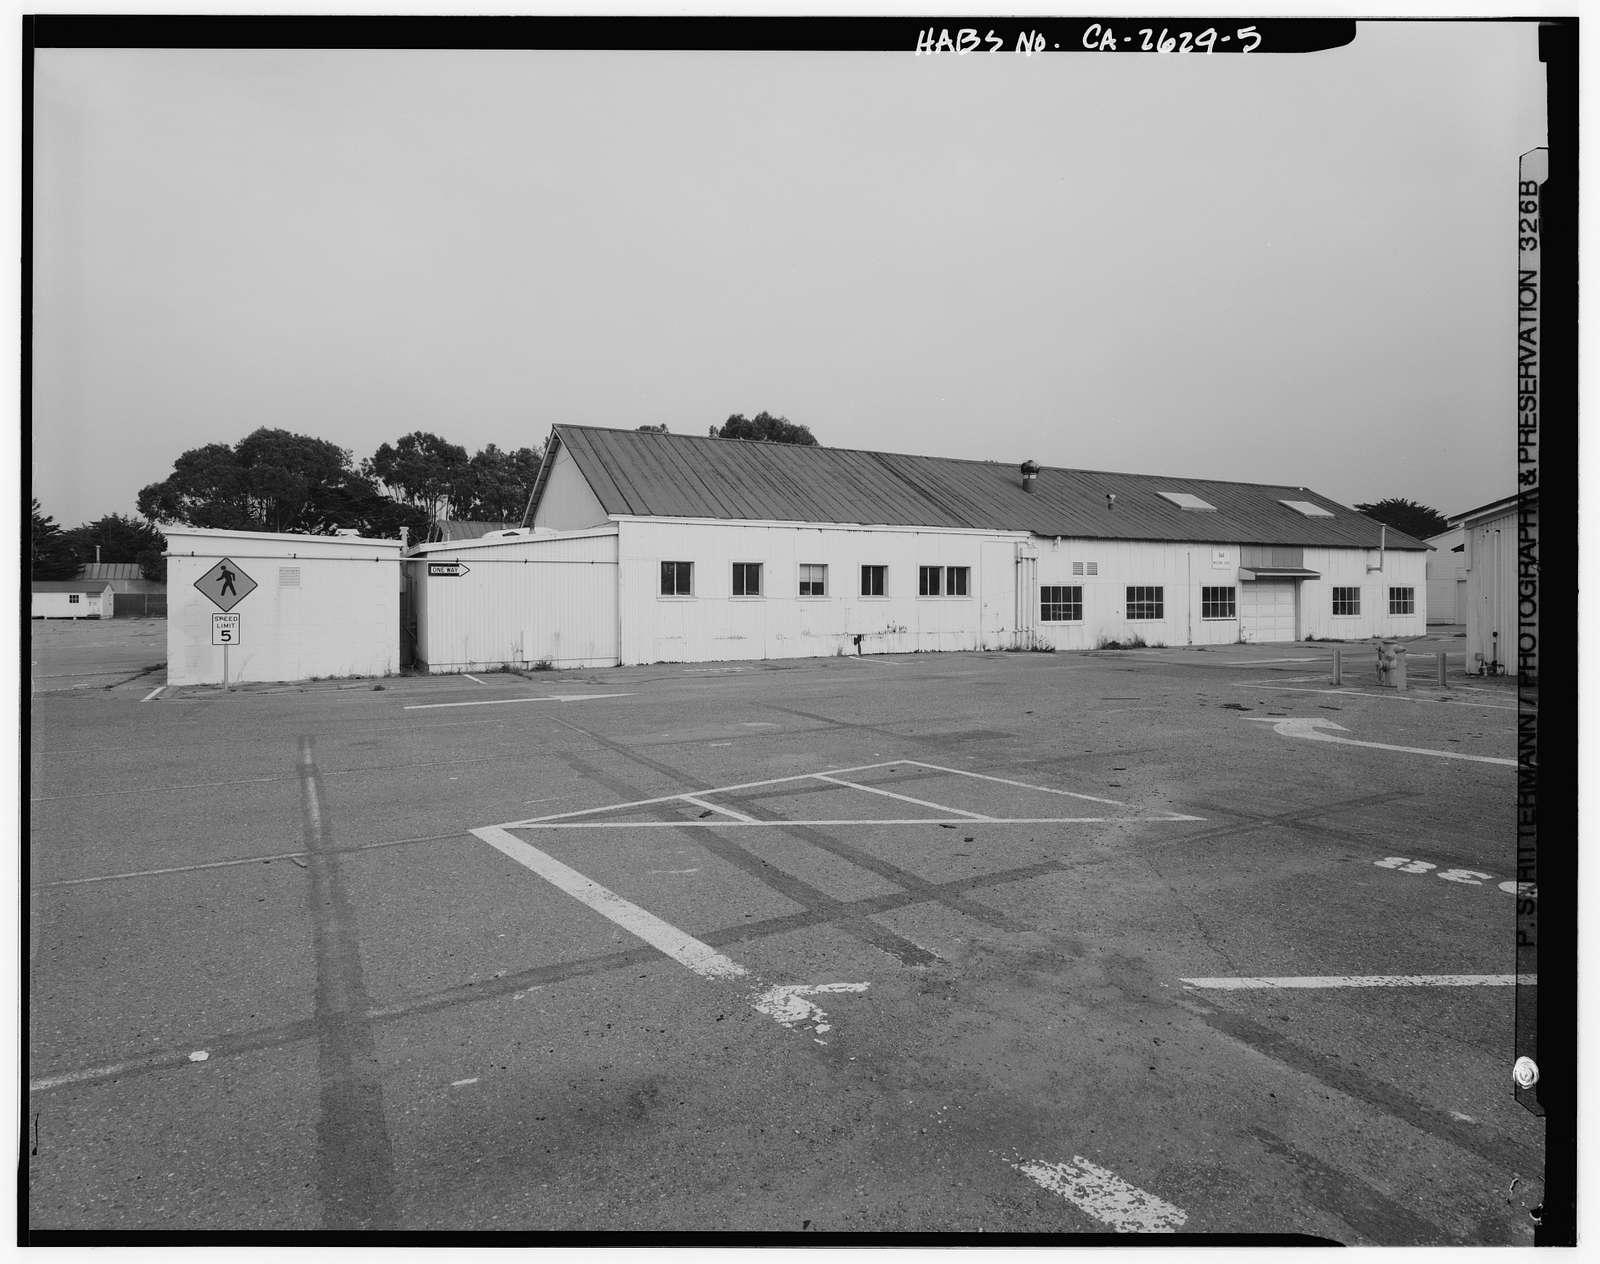 Presidio of San Francisco, Warehouse & Auto Shop, Crissy Field North cantonment, San Francisco, San Francisco County, CA